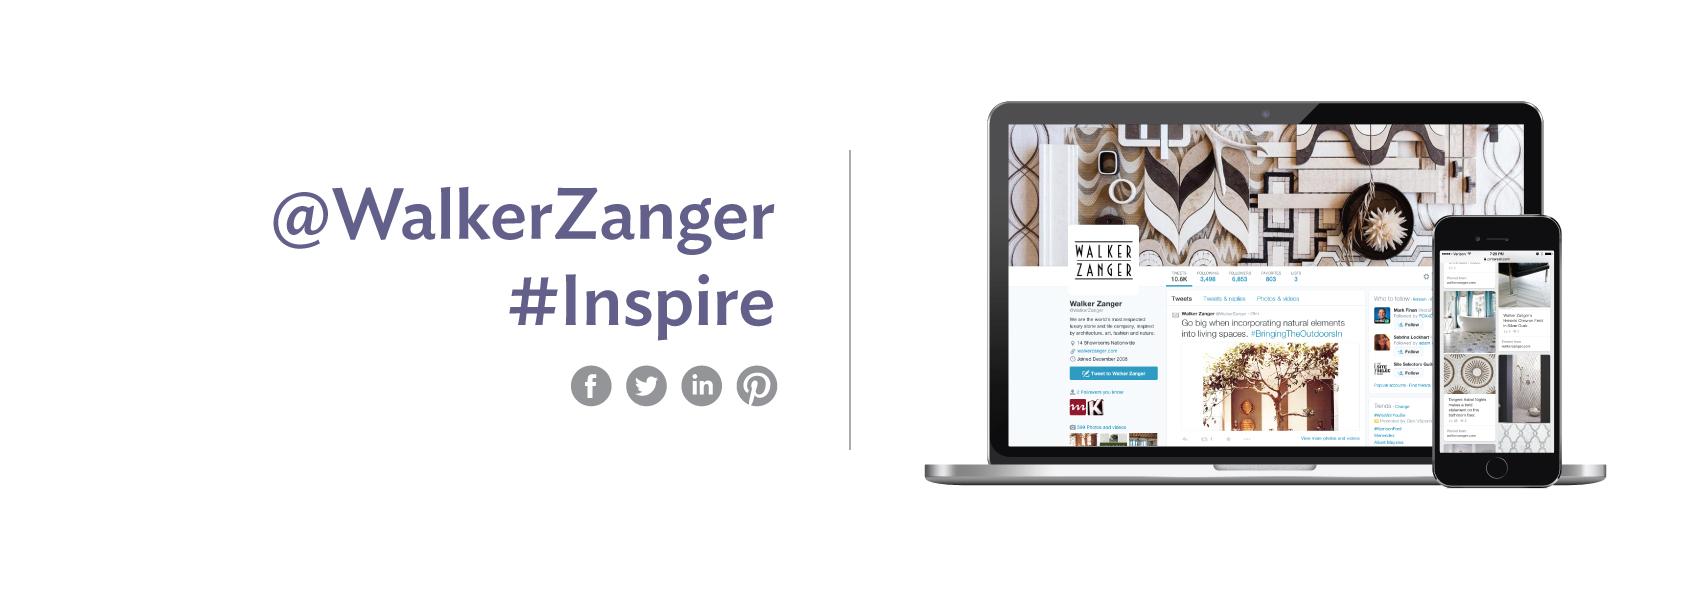 Walker Zanger social media